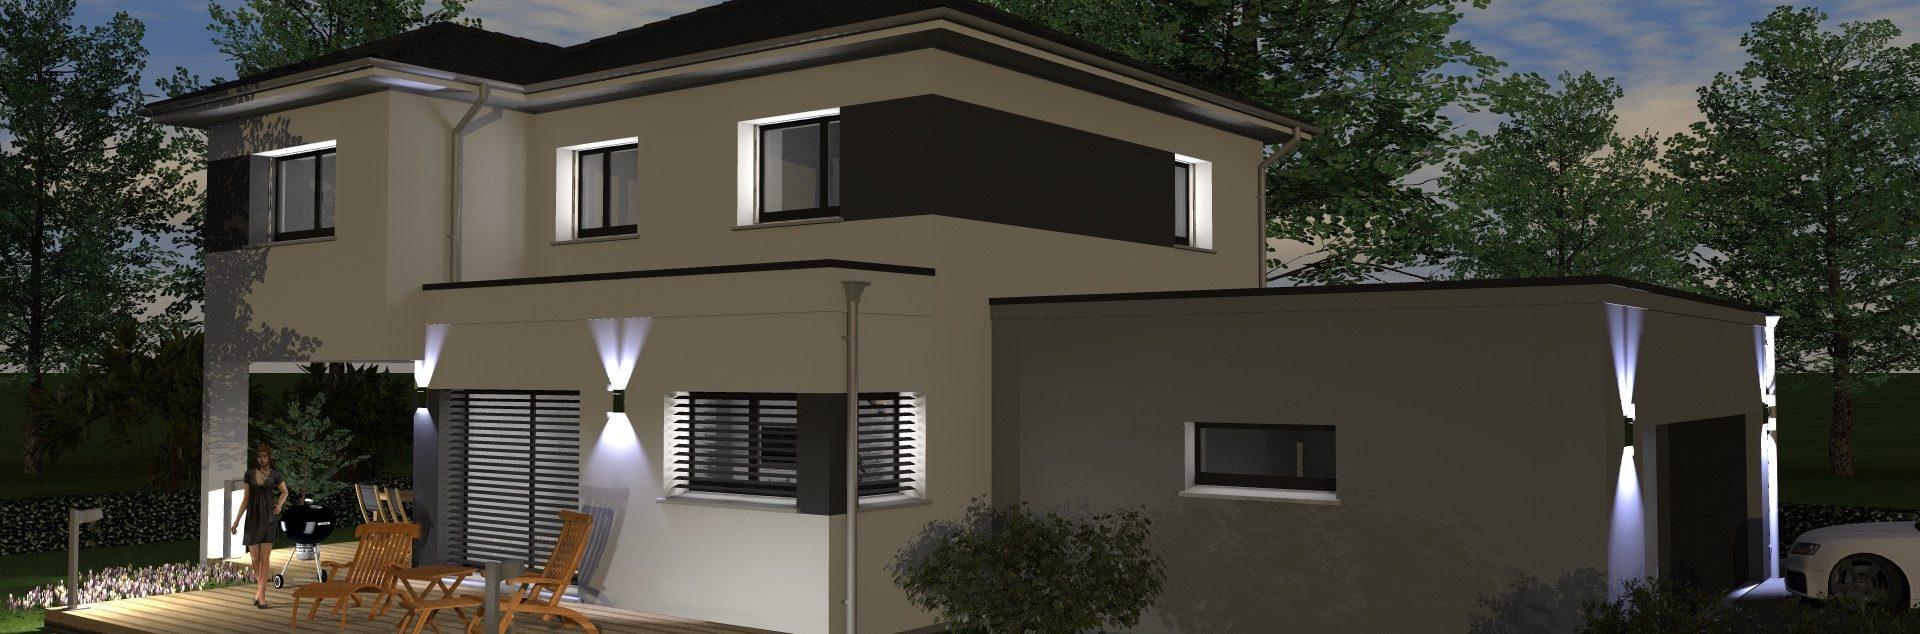 131 m²